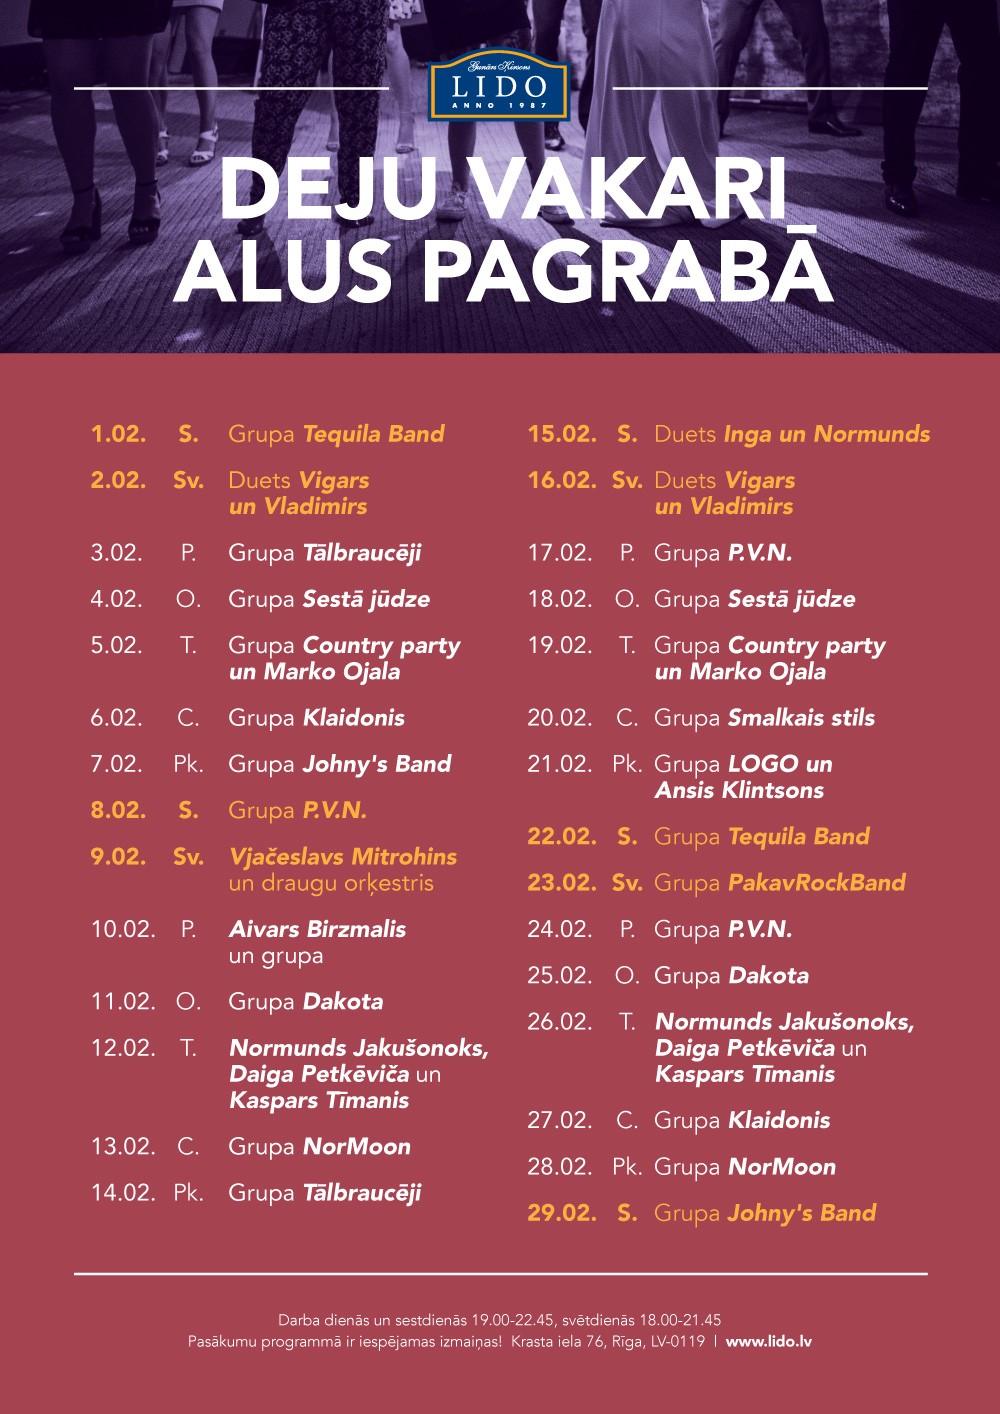 DejuVakariPagrabs-Februaris-A4-01.2020.jpg